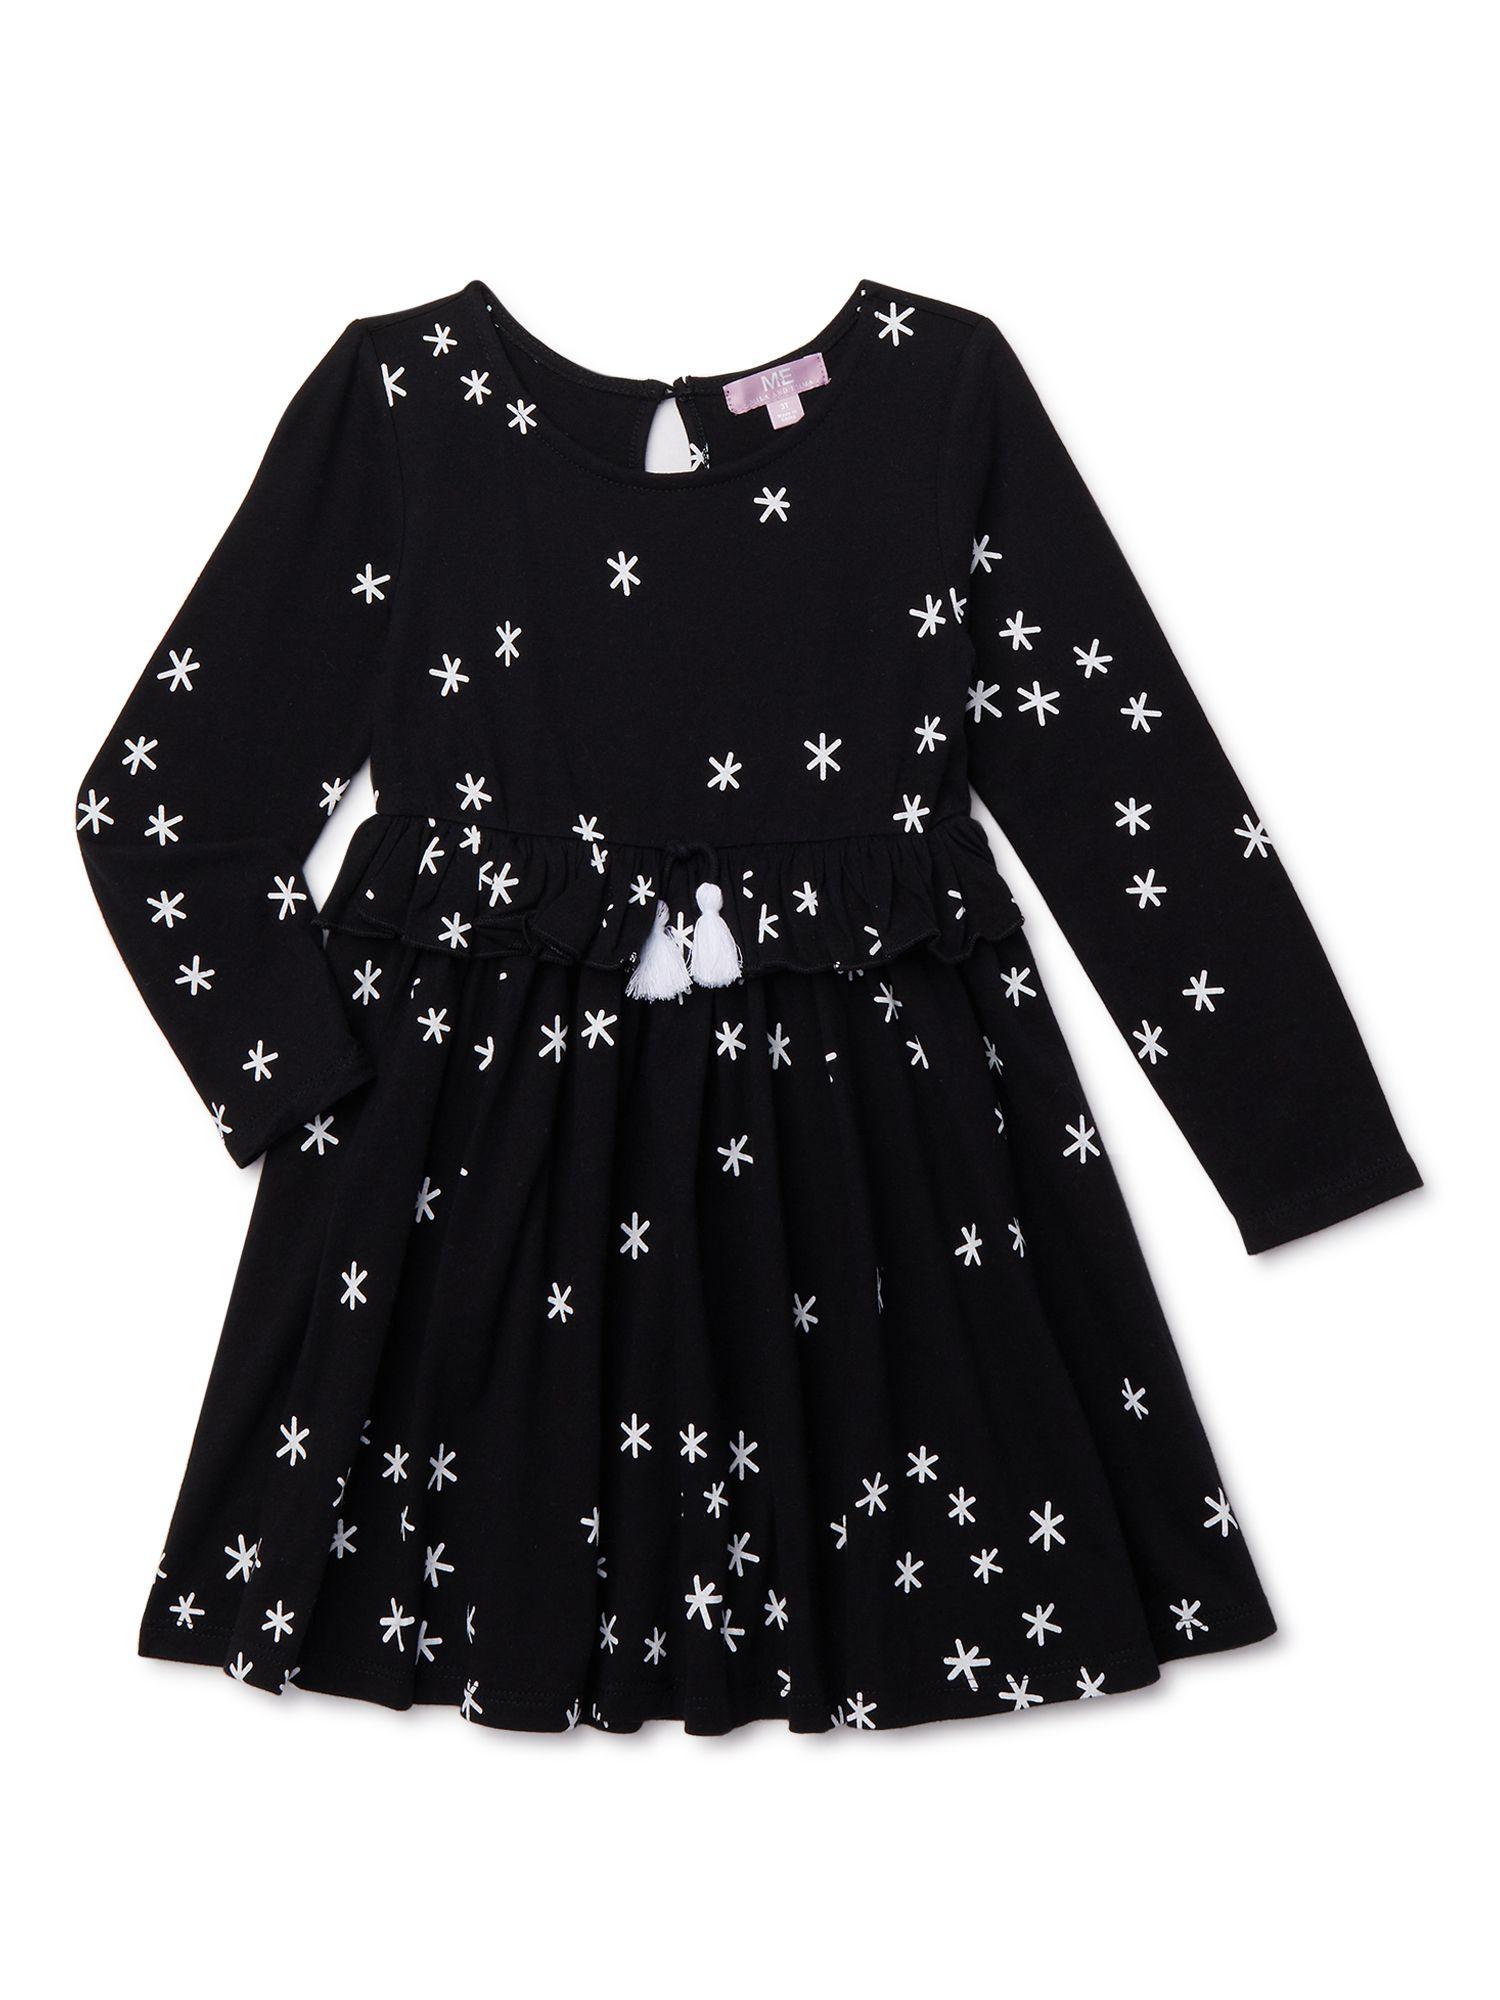 Mila Emma Mila Emma Exclusive Girls Fashion Tassel Dress Sizes 4 18 Walmart Com In 2021 Girl Fashion Fashion Tassels Fashion [ 2000 x 1500 Pixel ]